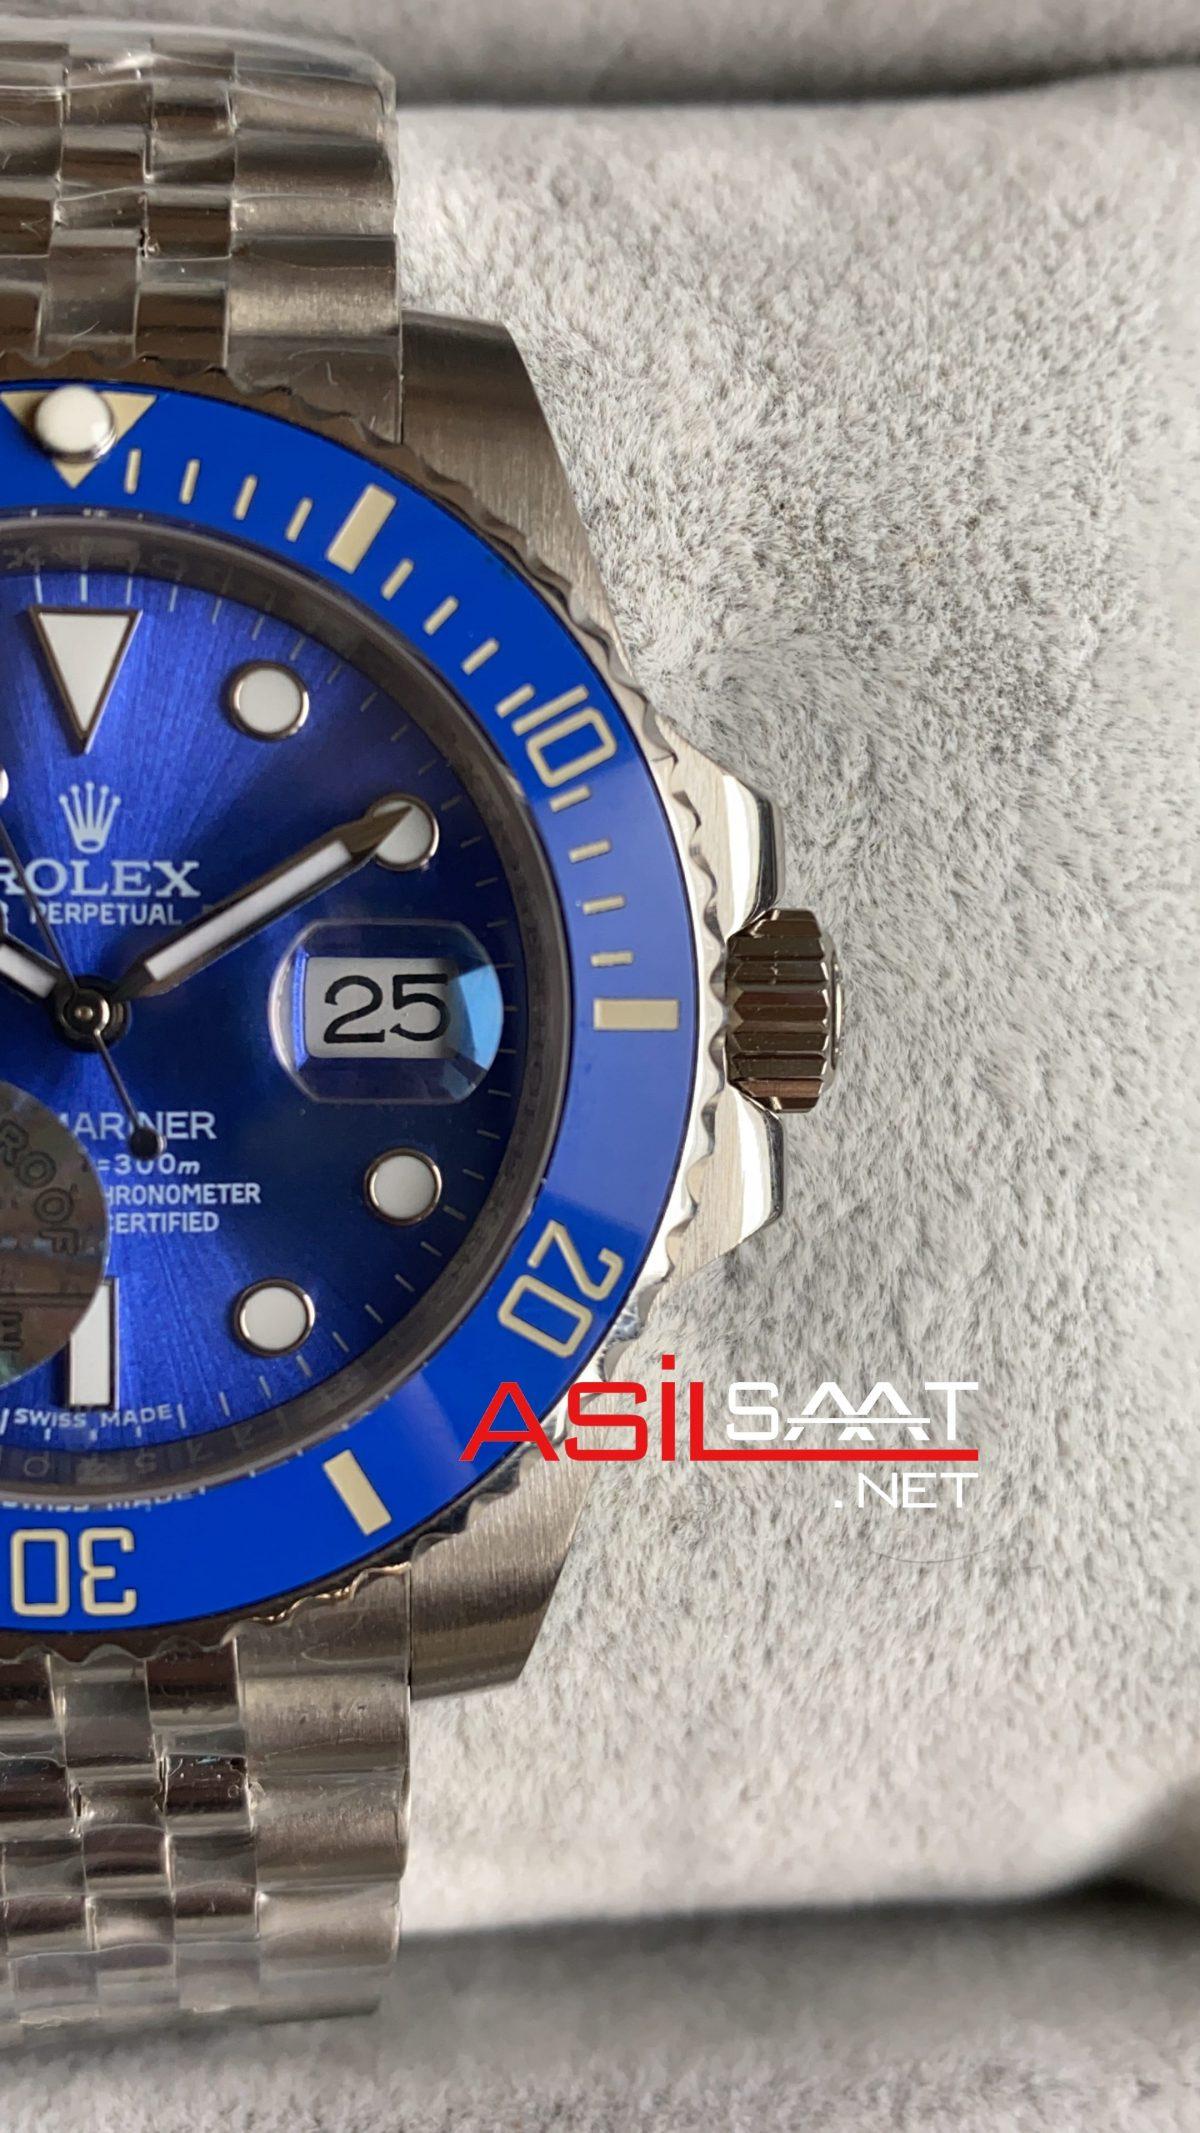 Rolex Jubilee Submariner Smurf 116619 LB ROLS018